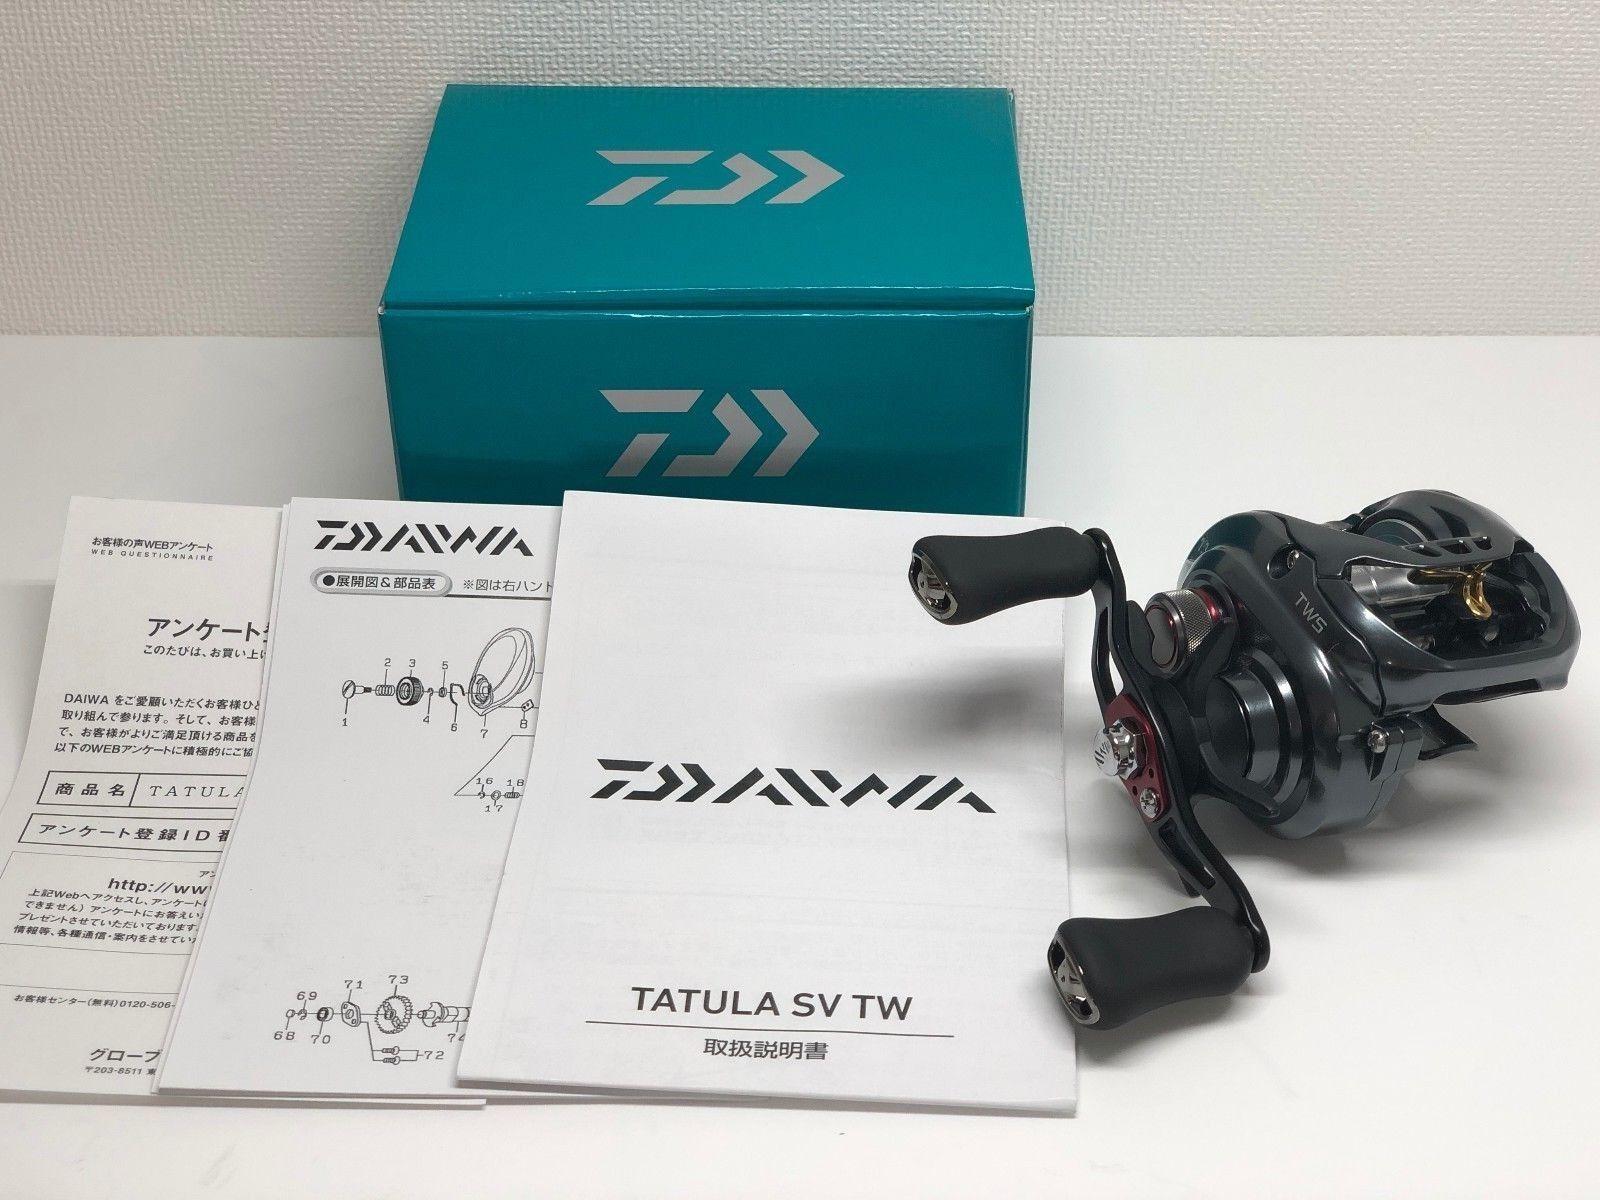 DAIWA 17 TATULA SV TW  7.3R  TW  - Free Shipping from Japan e9b733